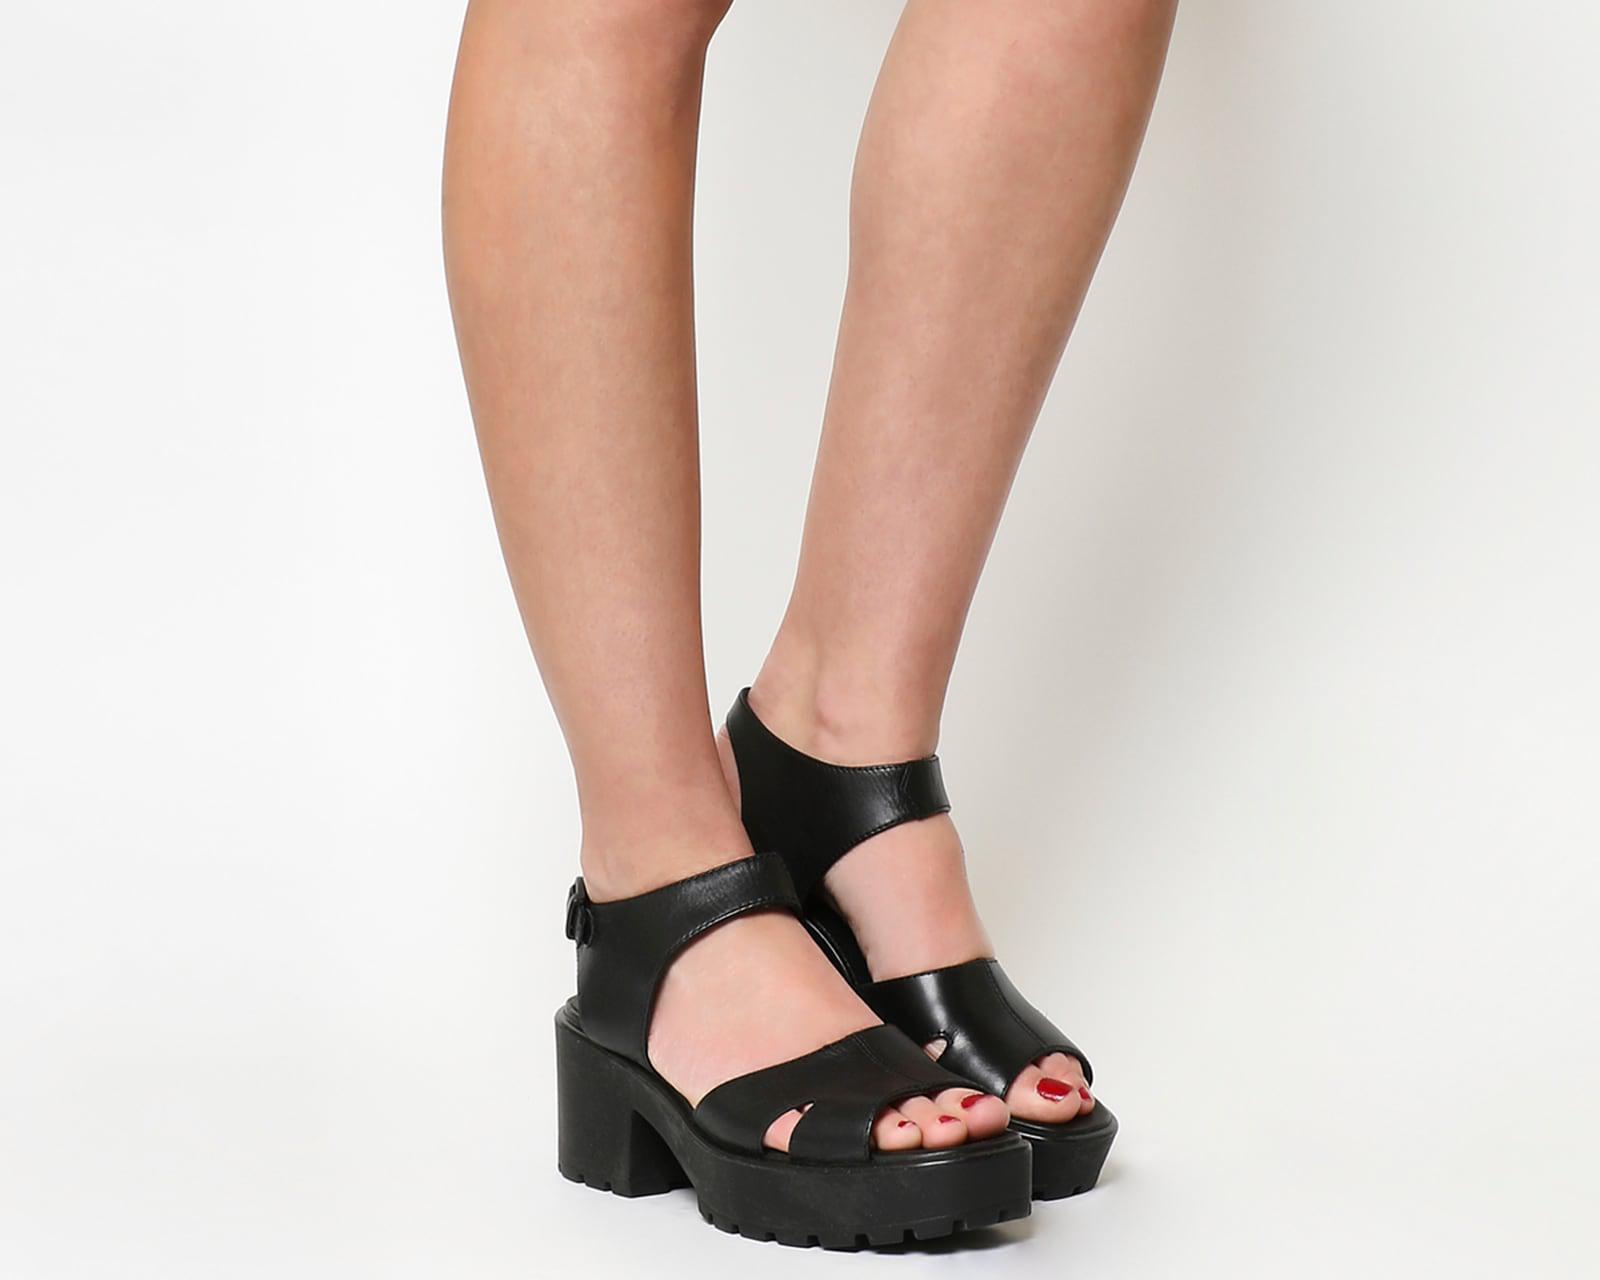 4c0aa4eb872 Gallery. Women s Heeled Clogs Women s Wrap Around Sandals ...